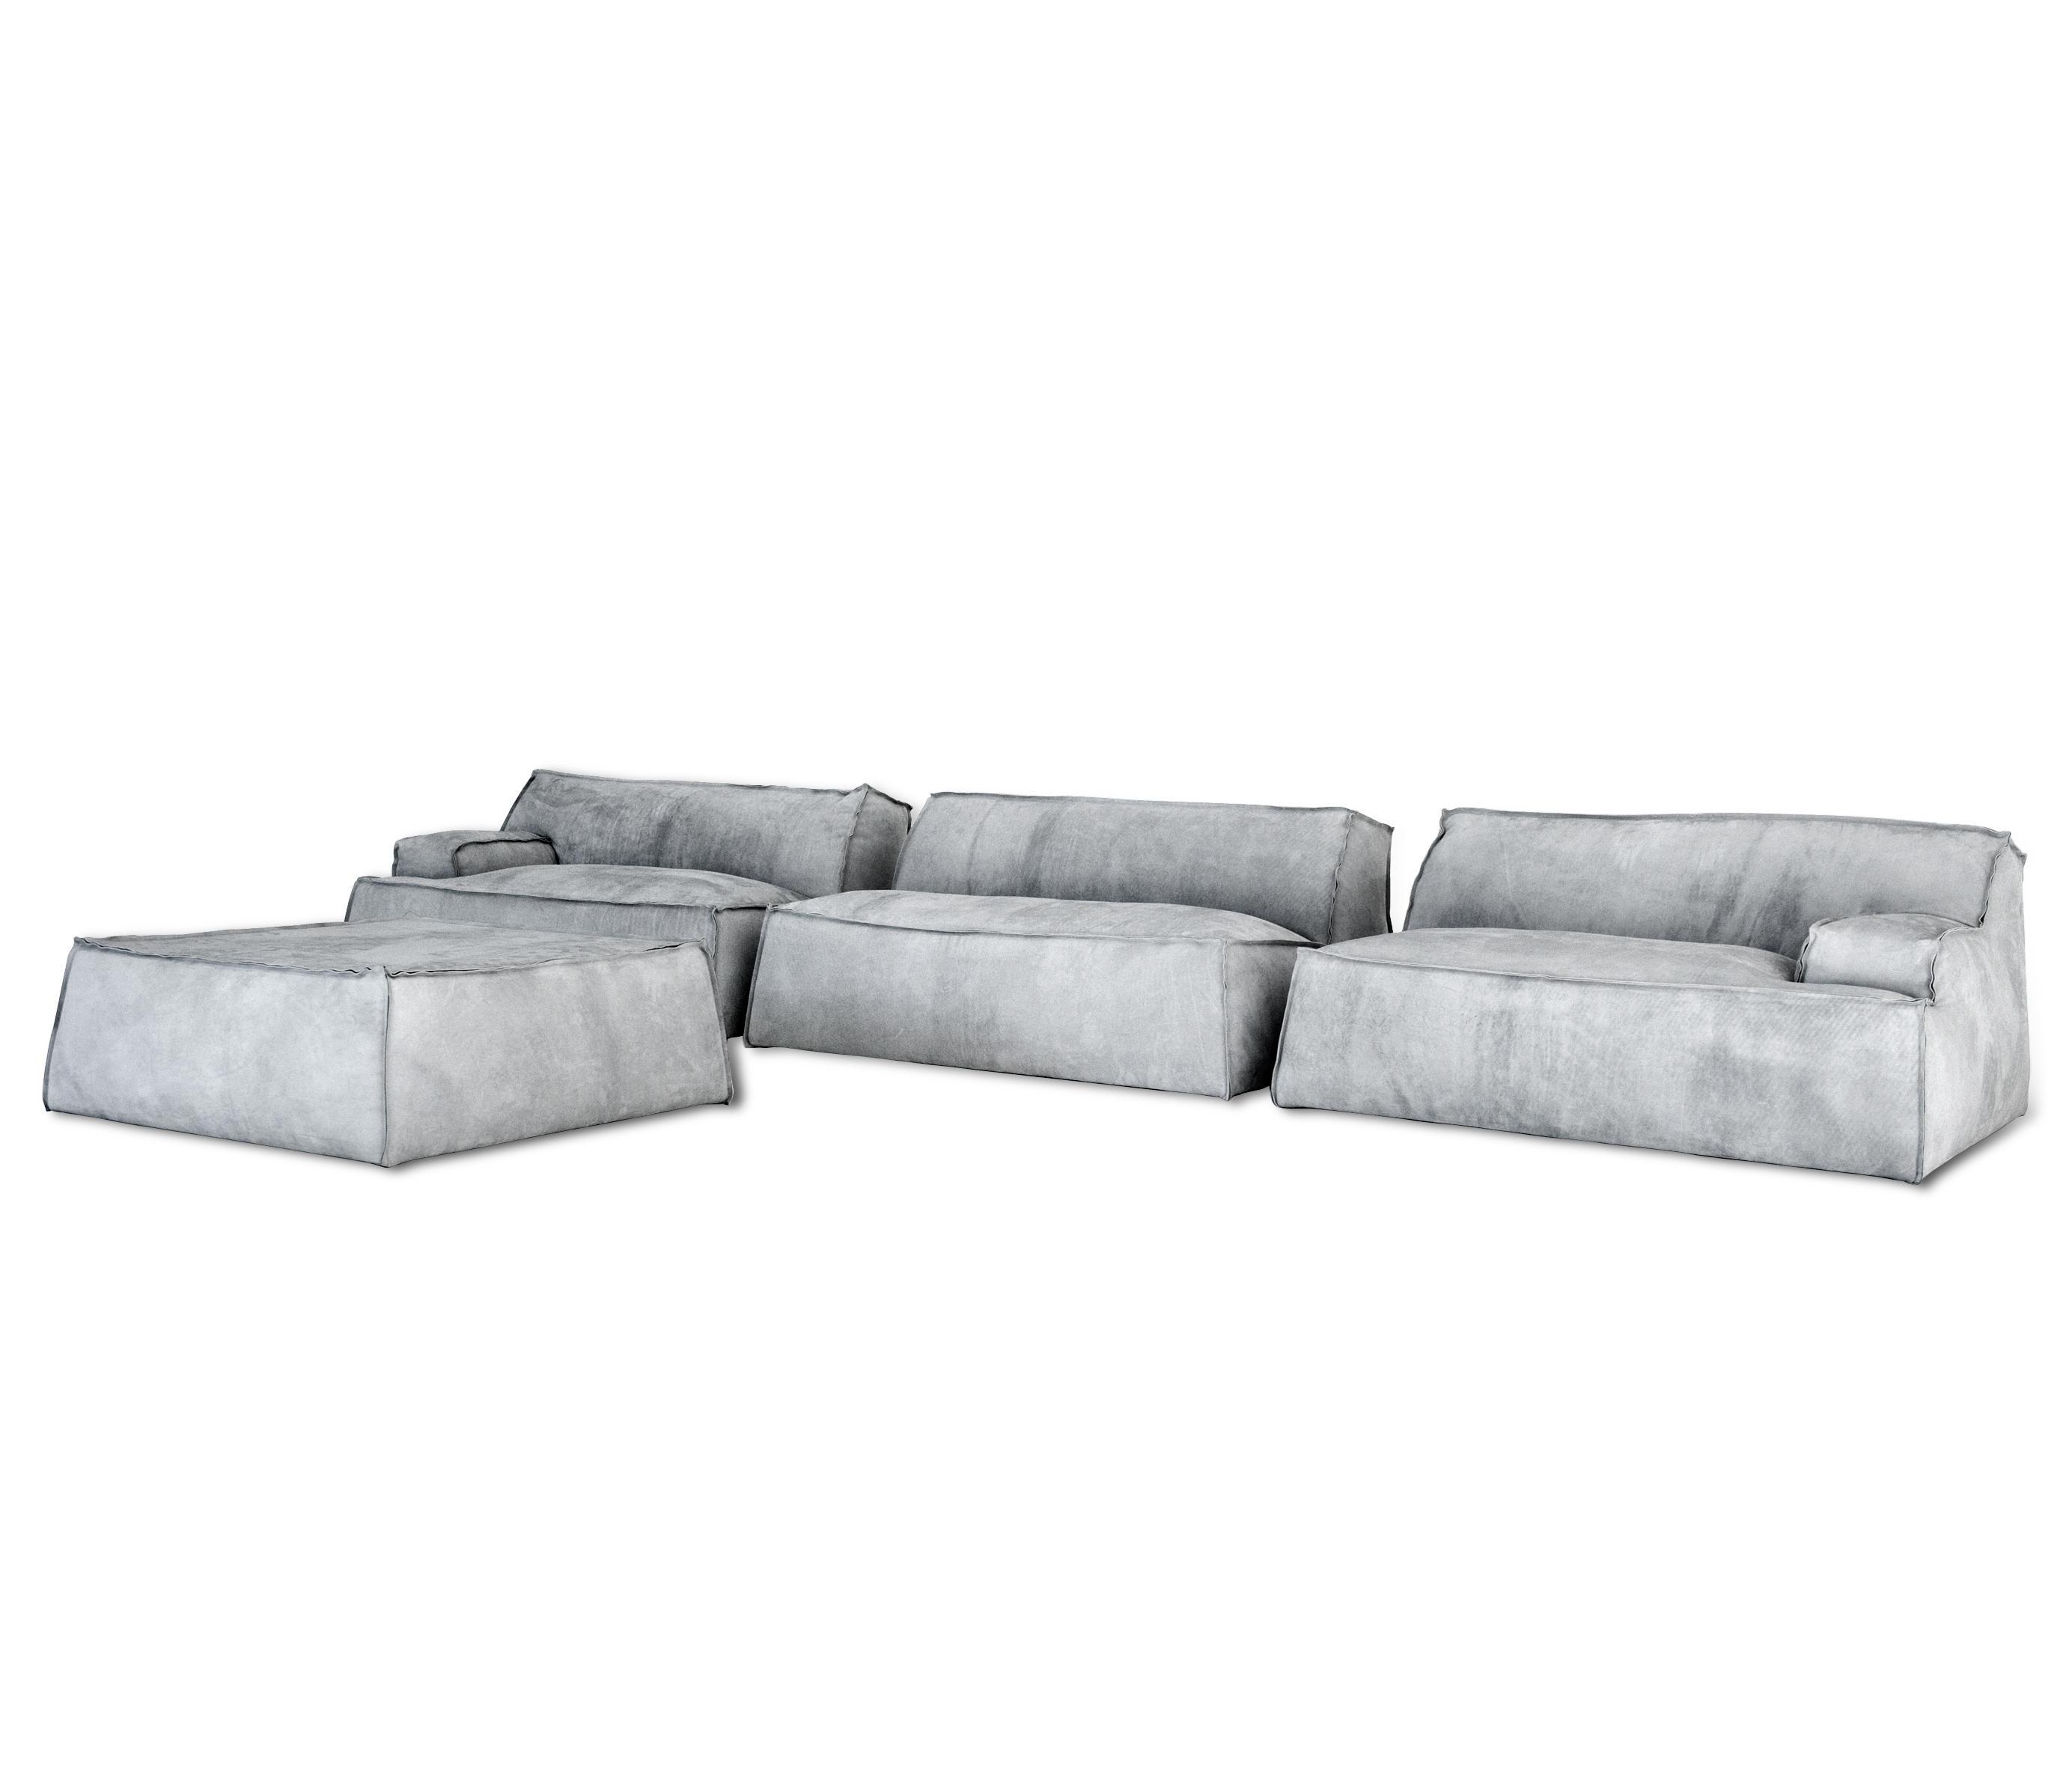 DAMASCO Sofa By Baxter | Modular Seating Elements